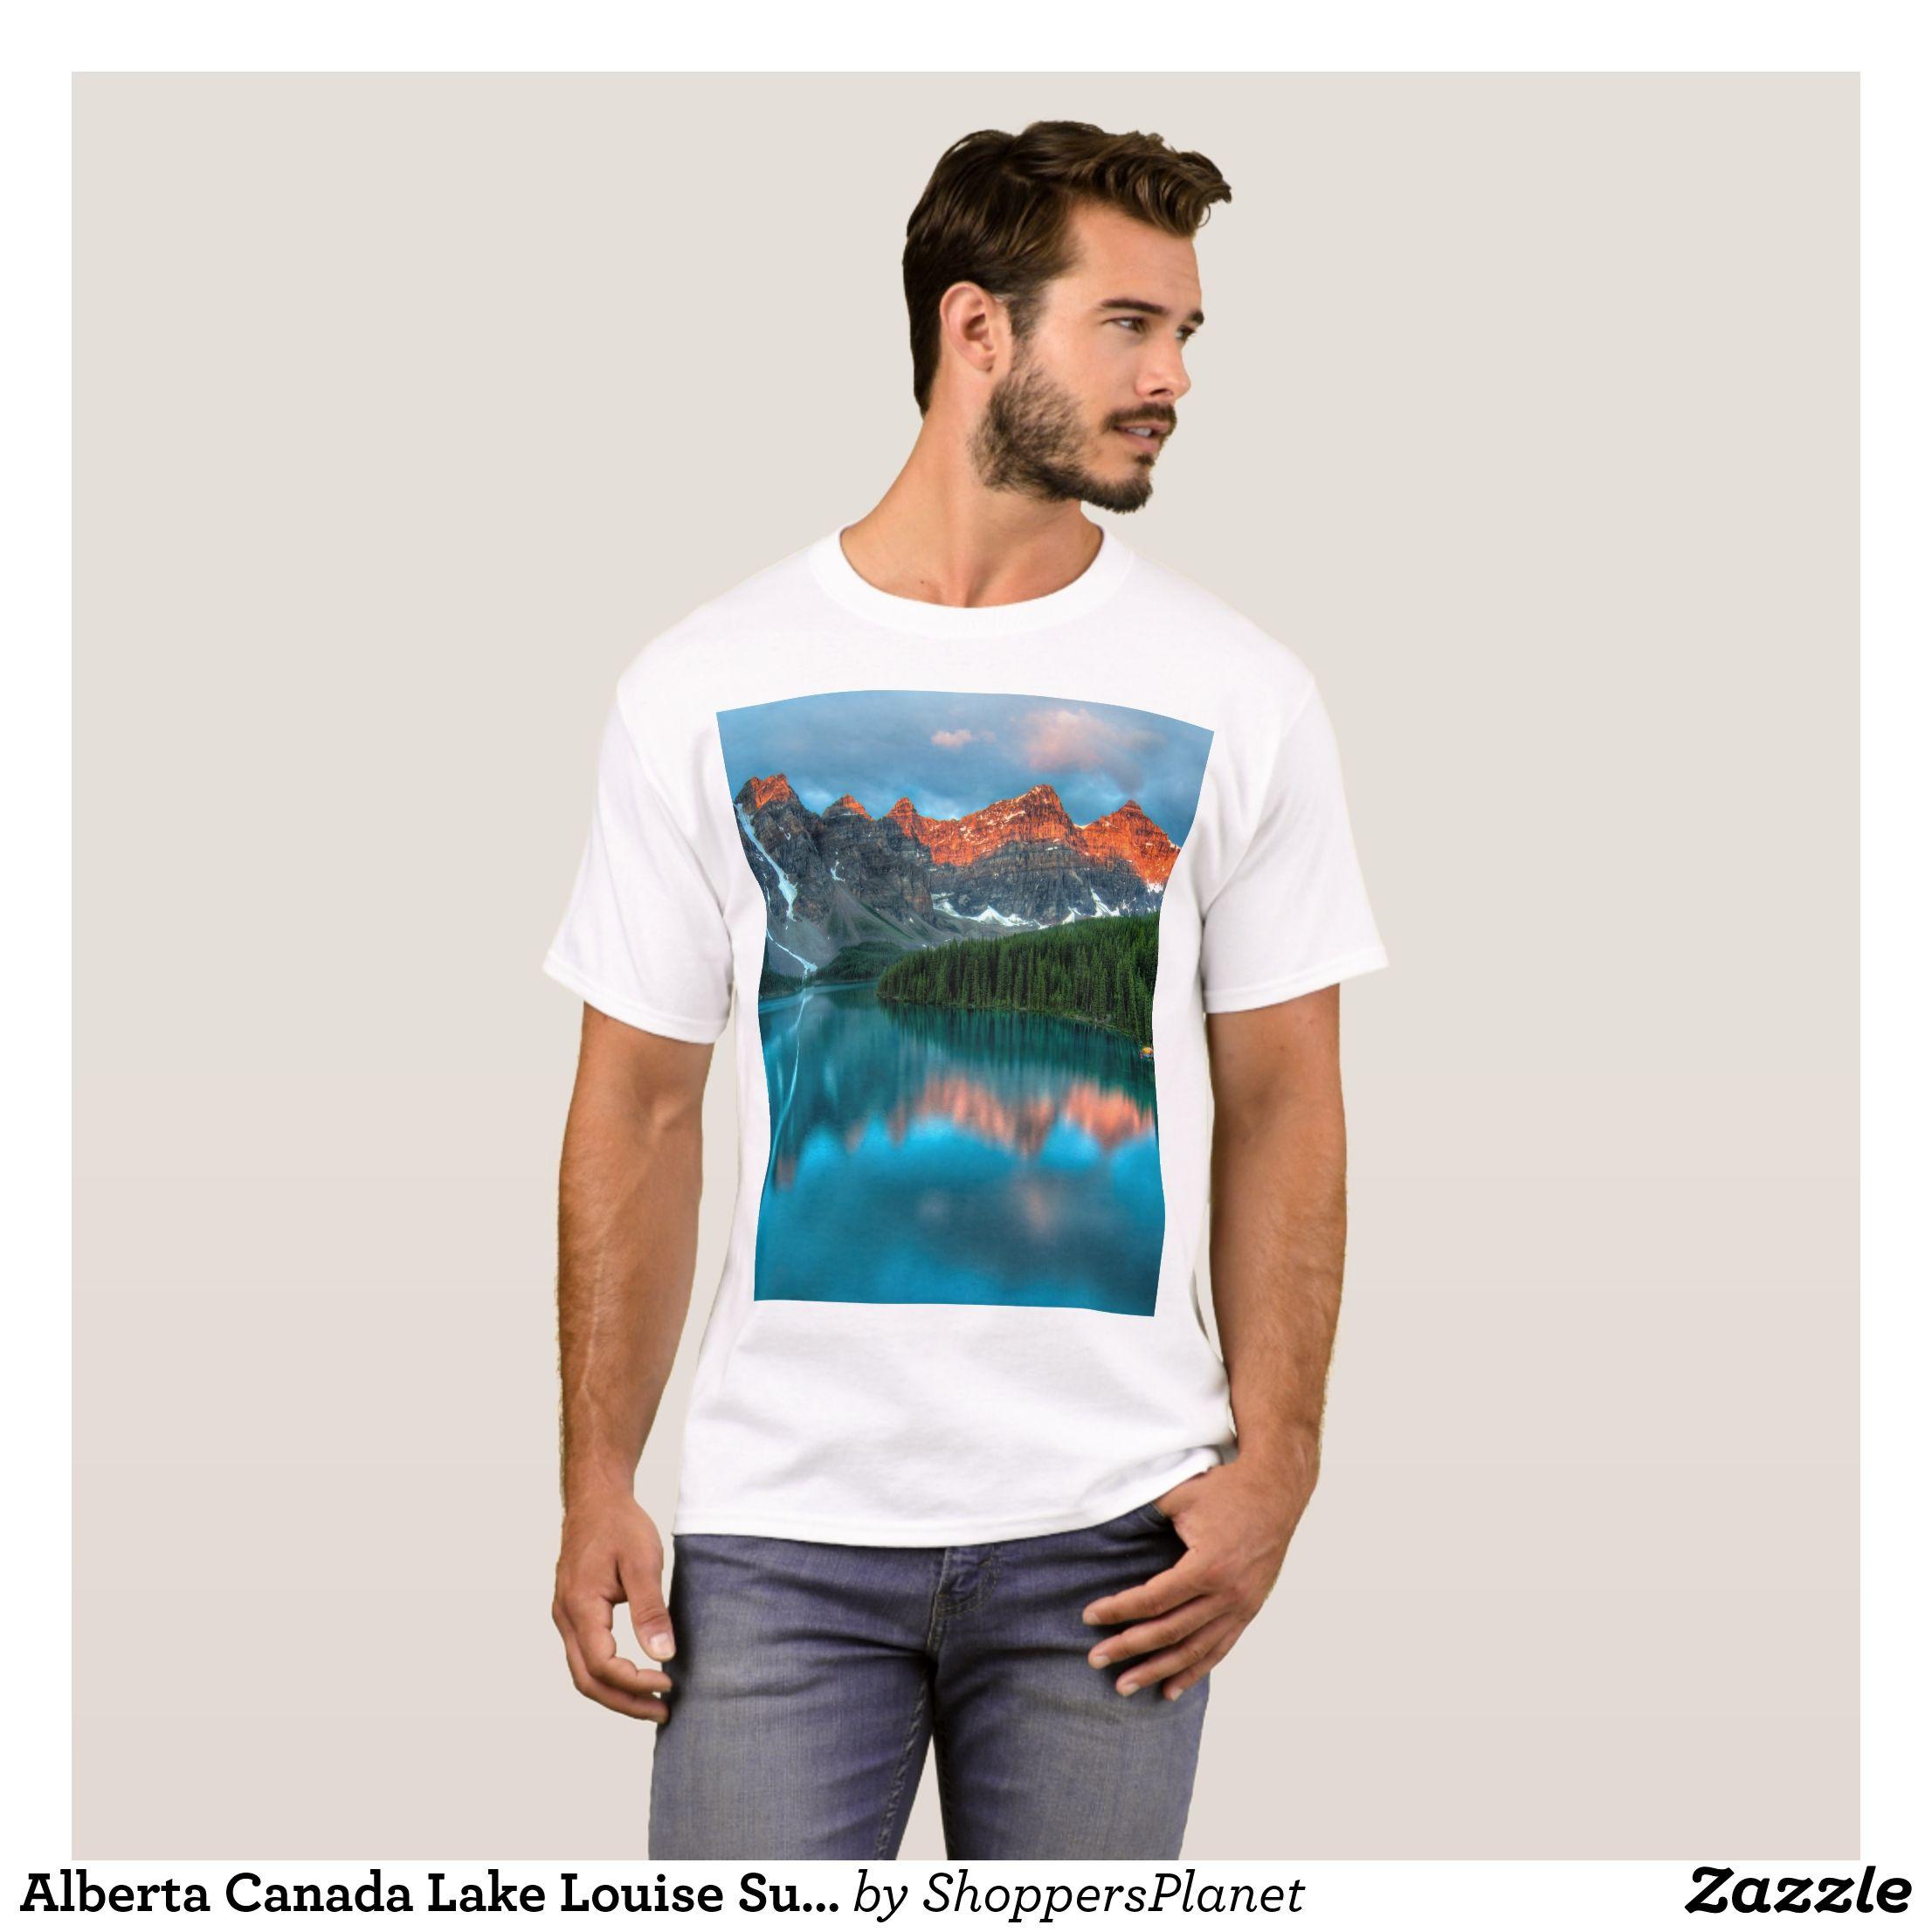 Alberta Canada Lake Louise Summer Adventure TShirt